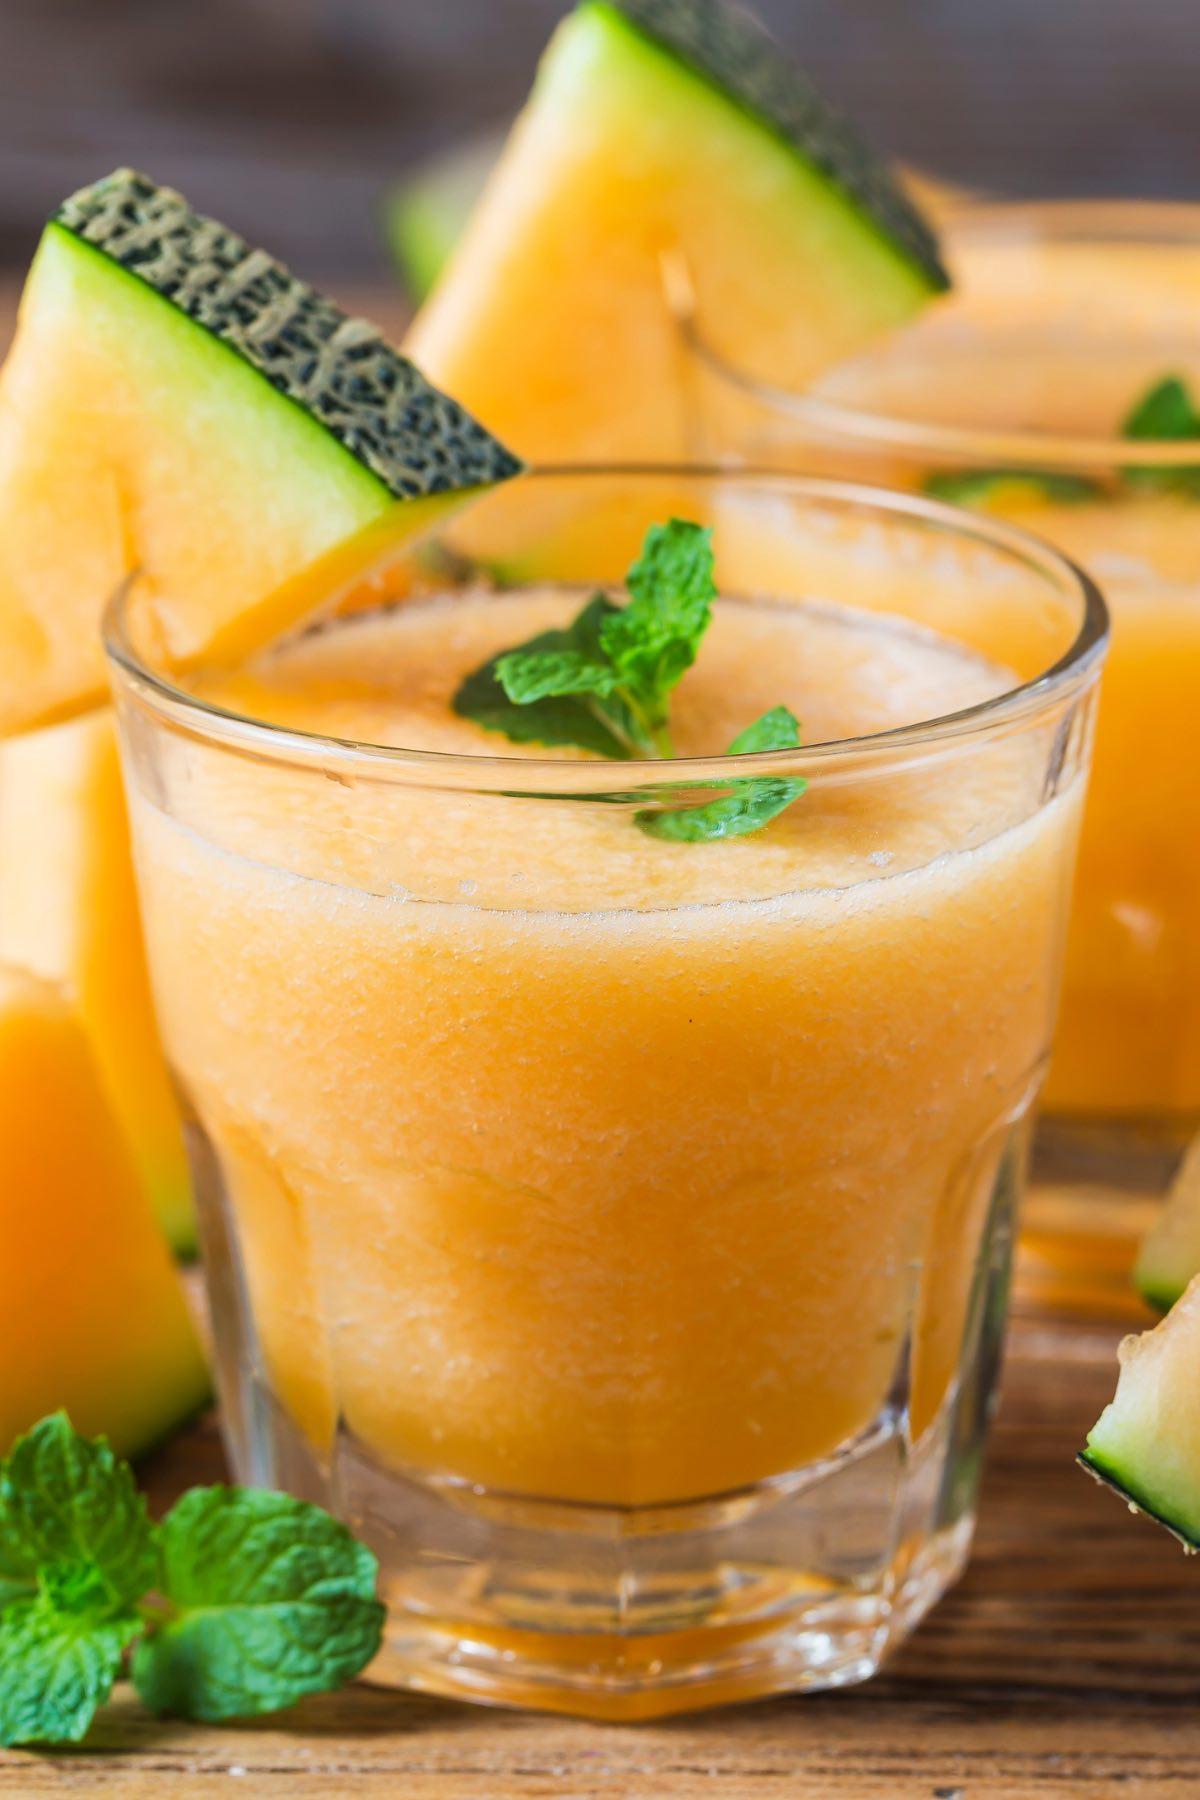 Homemade cantaloupe juice